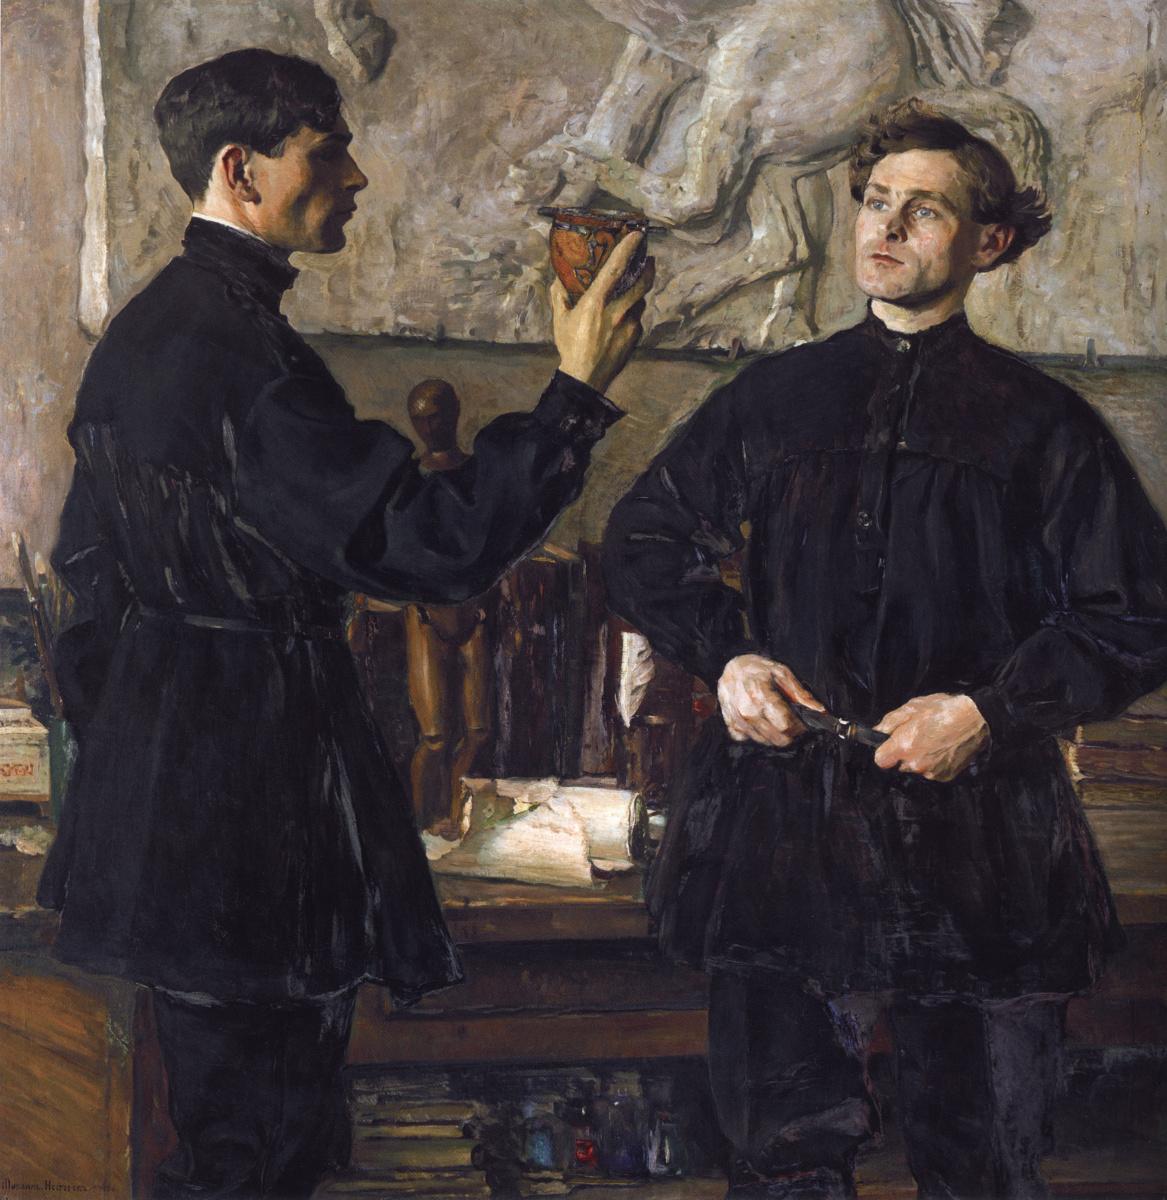 Mikhail Vasilyevich Nesterov. Portrait artists P. D. and A. D. Korenich